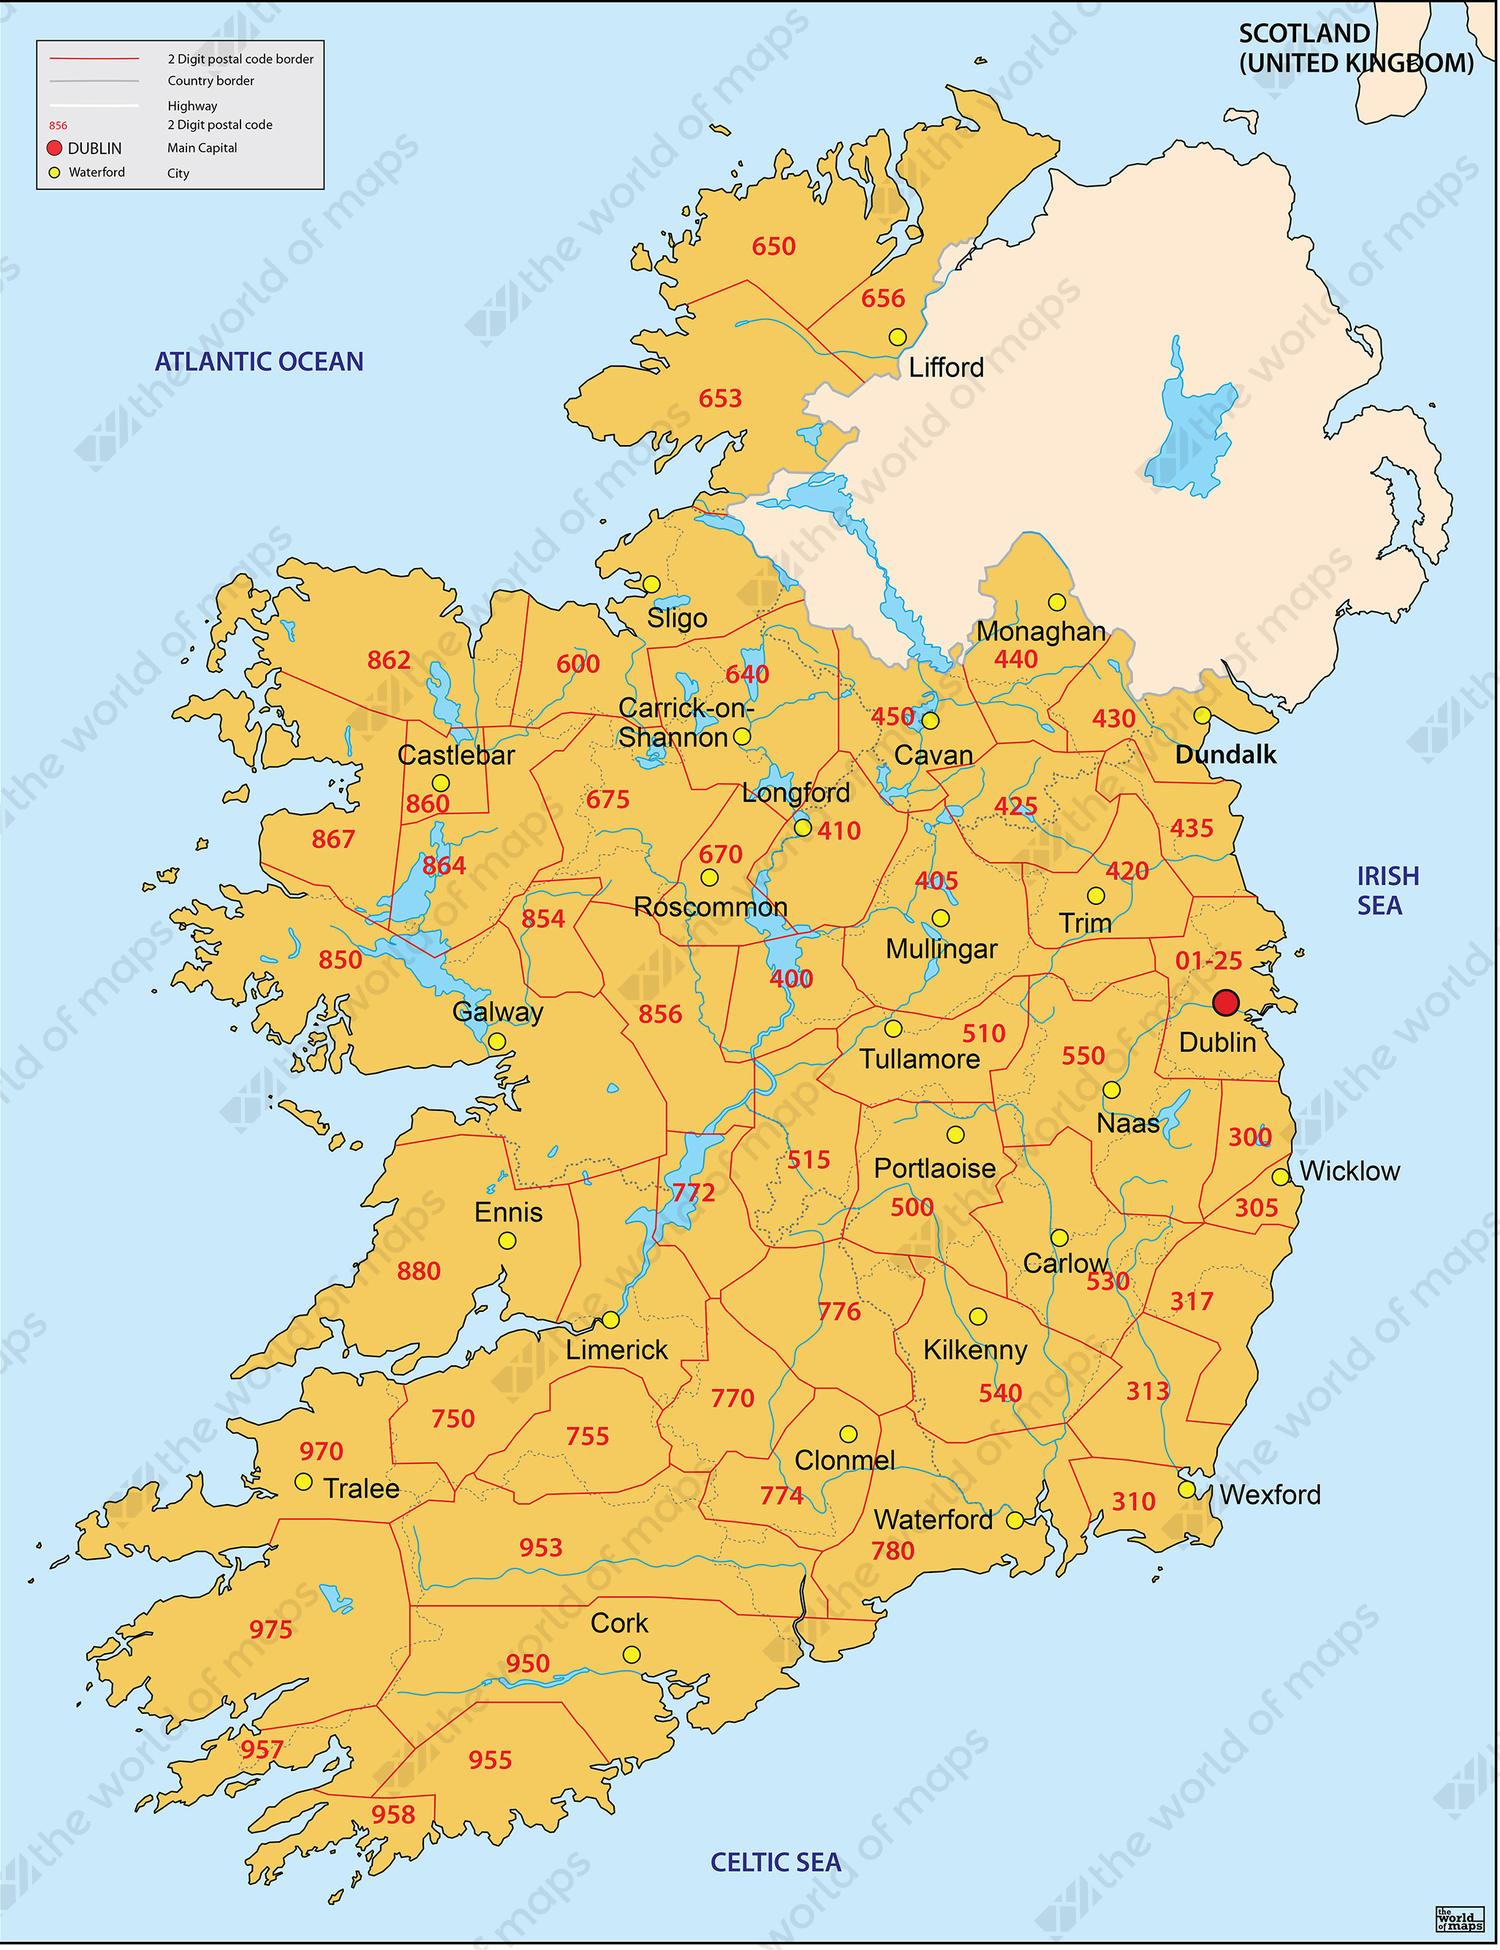 Country Map Of Ireland.Digital Postcode Map Ireland 3 Digit 650 The World Of Maps Com